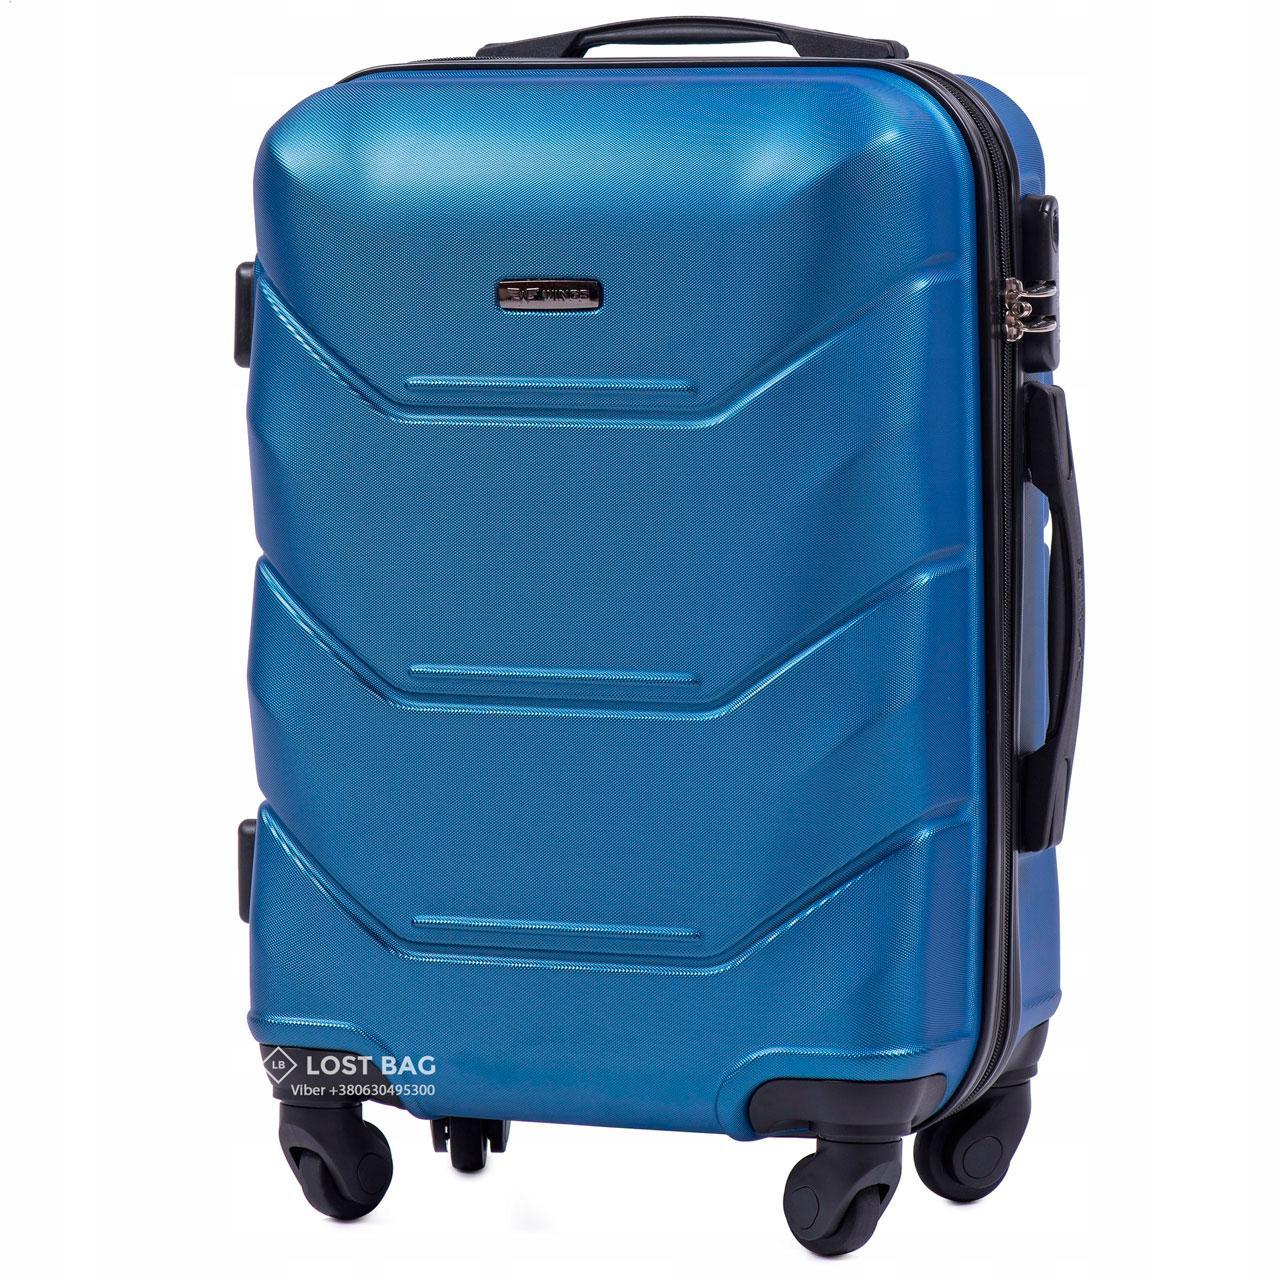 Чемодан пластиковый на 4 колесах Wings 147 Маленький Ручная кладь (S) Синий